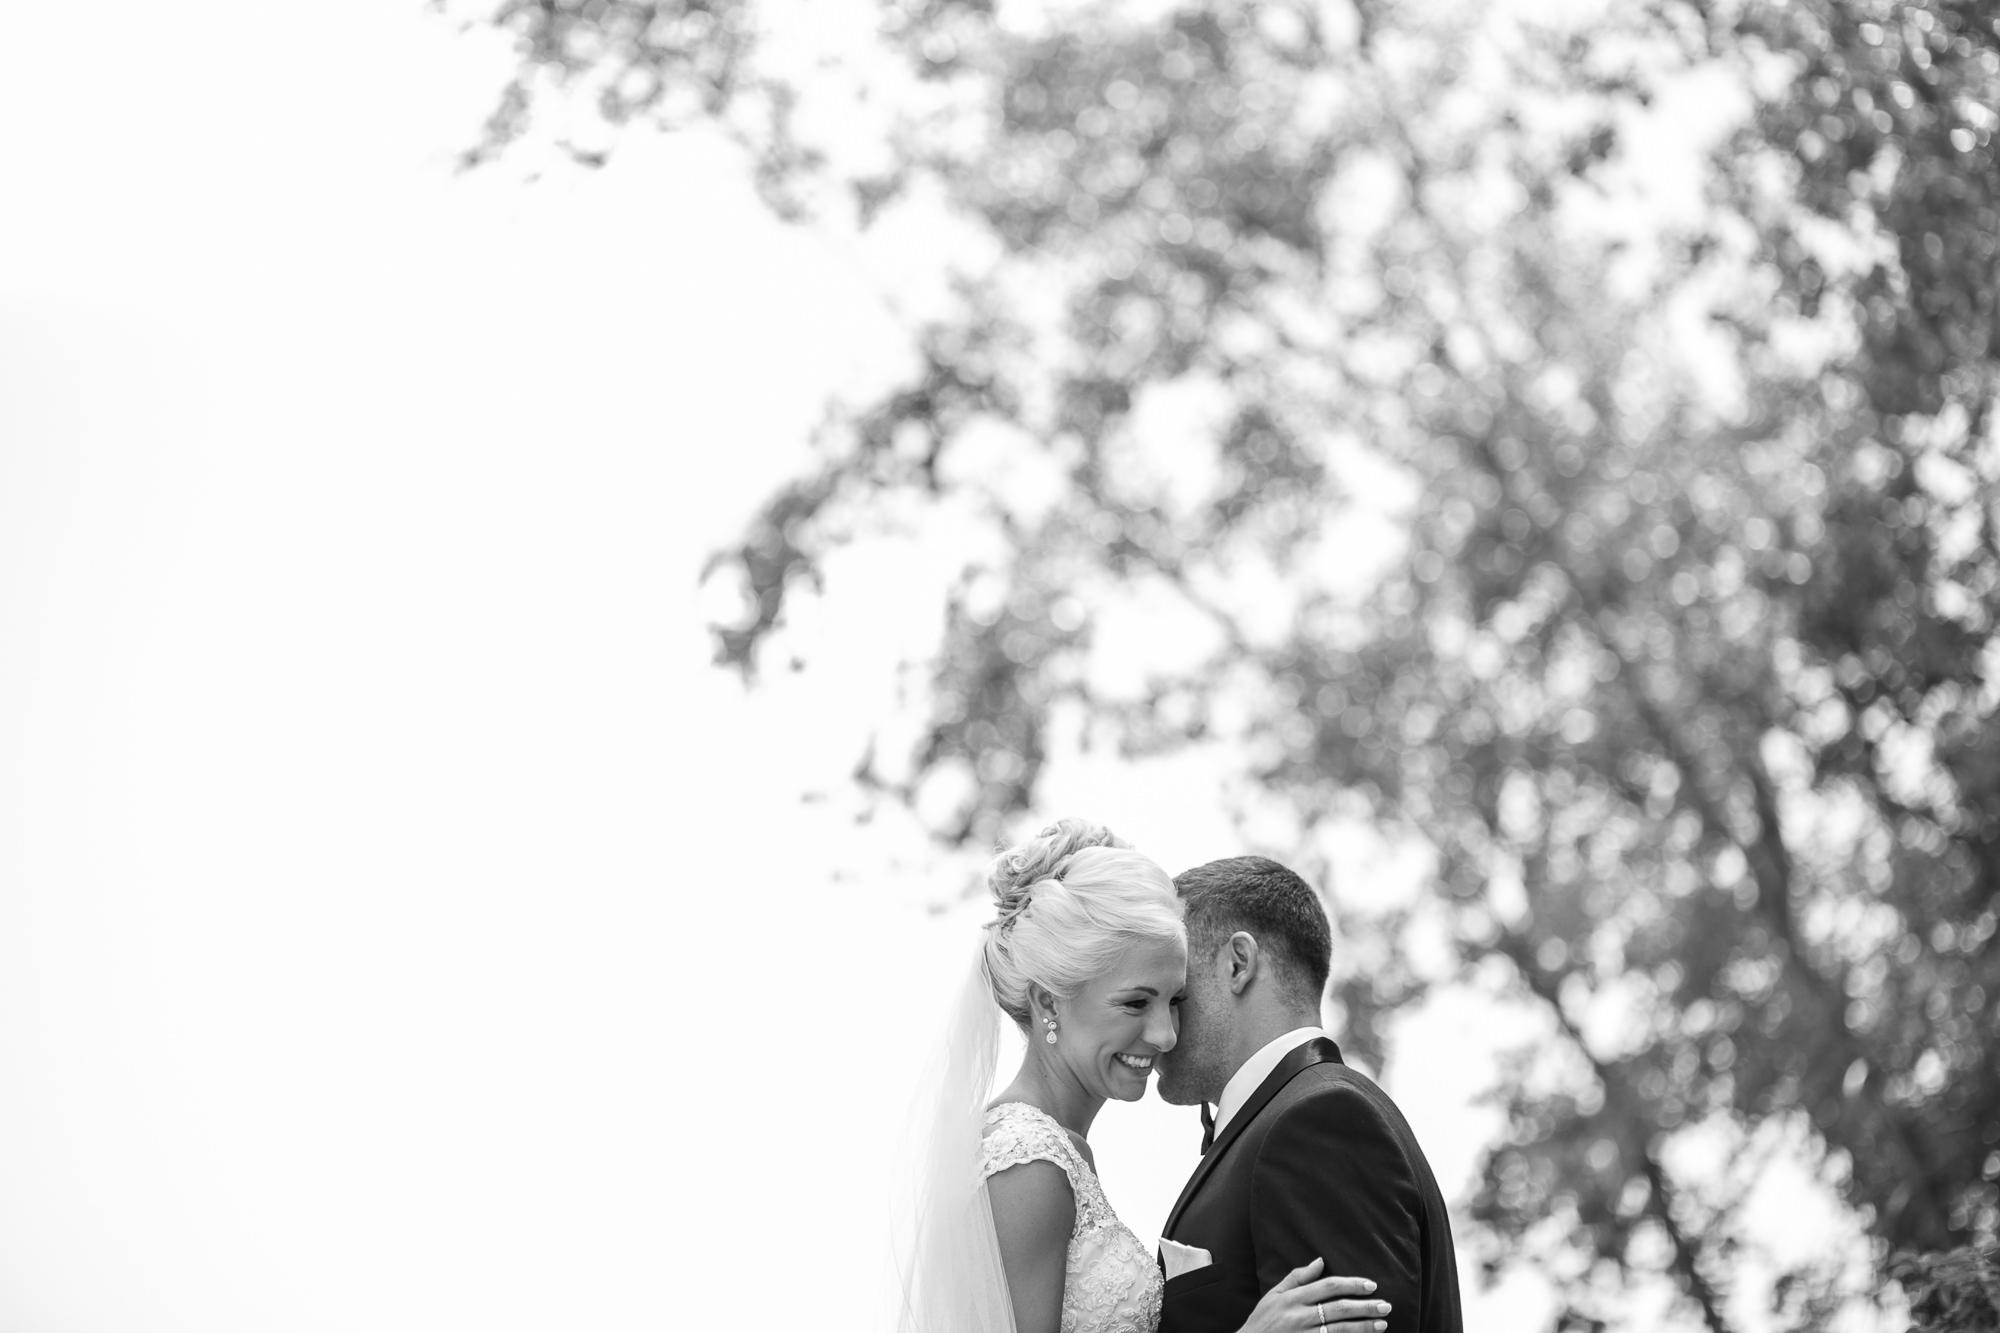 DAKOTA-DUNES-WEDDING-SOUTH-DAKOTA-WEDDING-PHOTOGRAPHER-0006.jpg